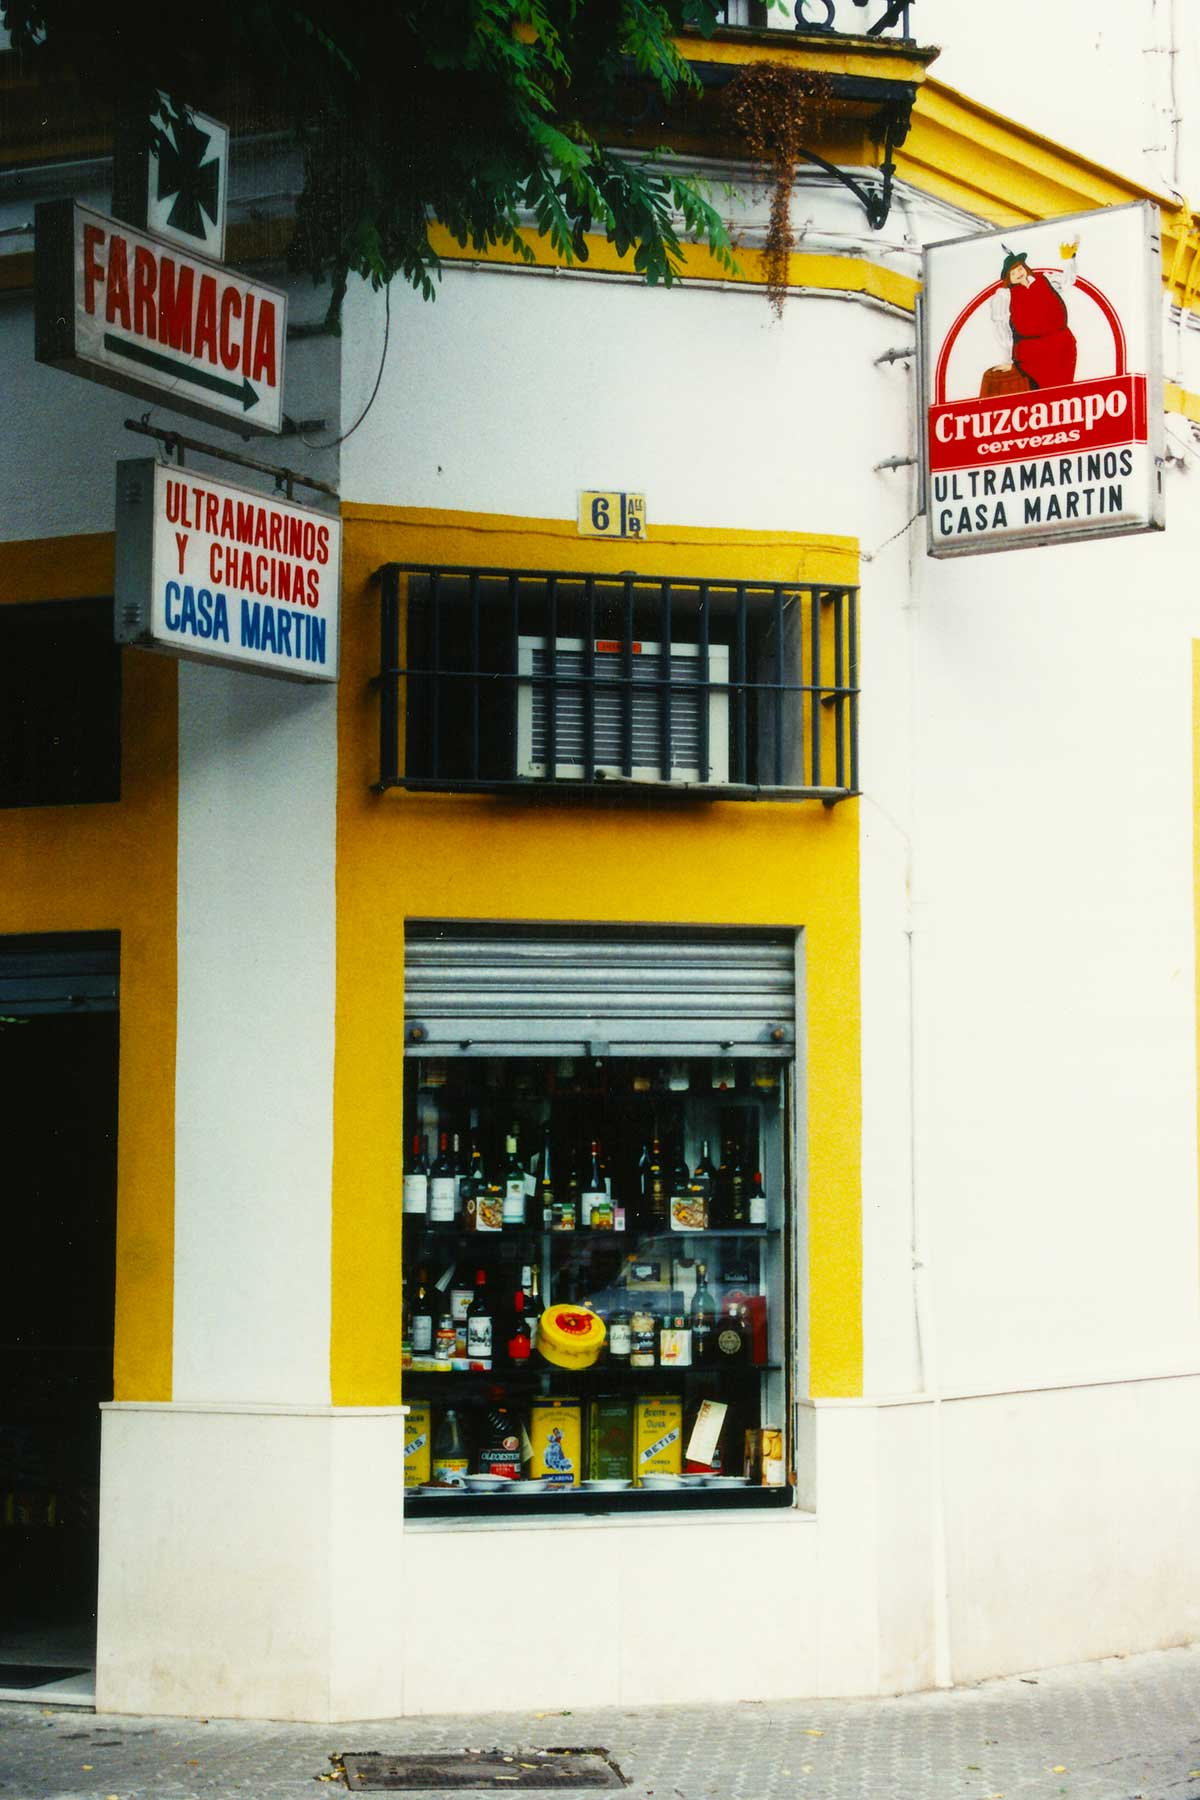 My Porvenir Apartment   Casa Martin   Seville Spain   Study Abroad Journal - Steven Andrew Martin - 1998